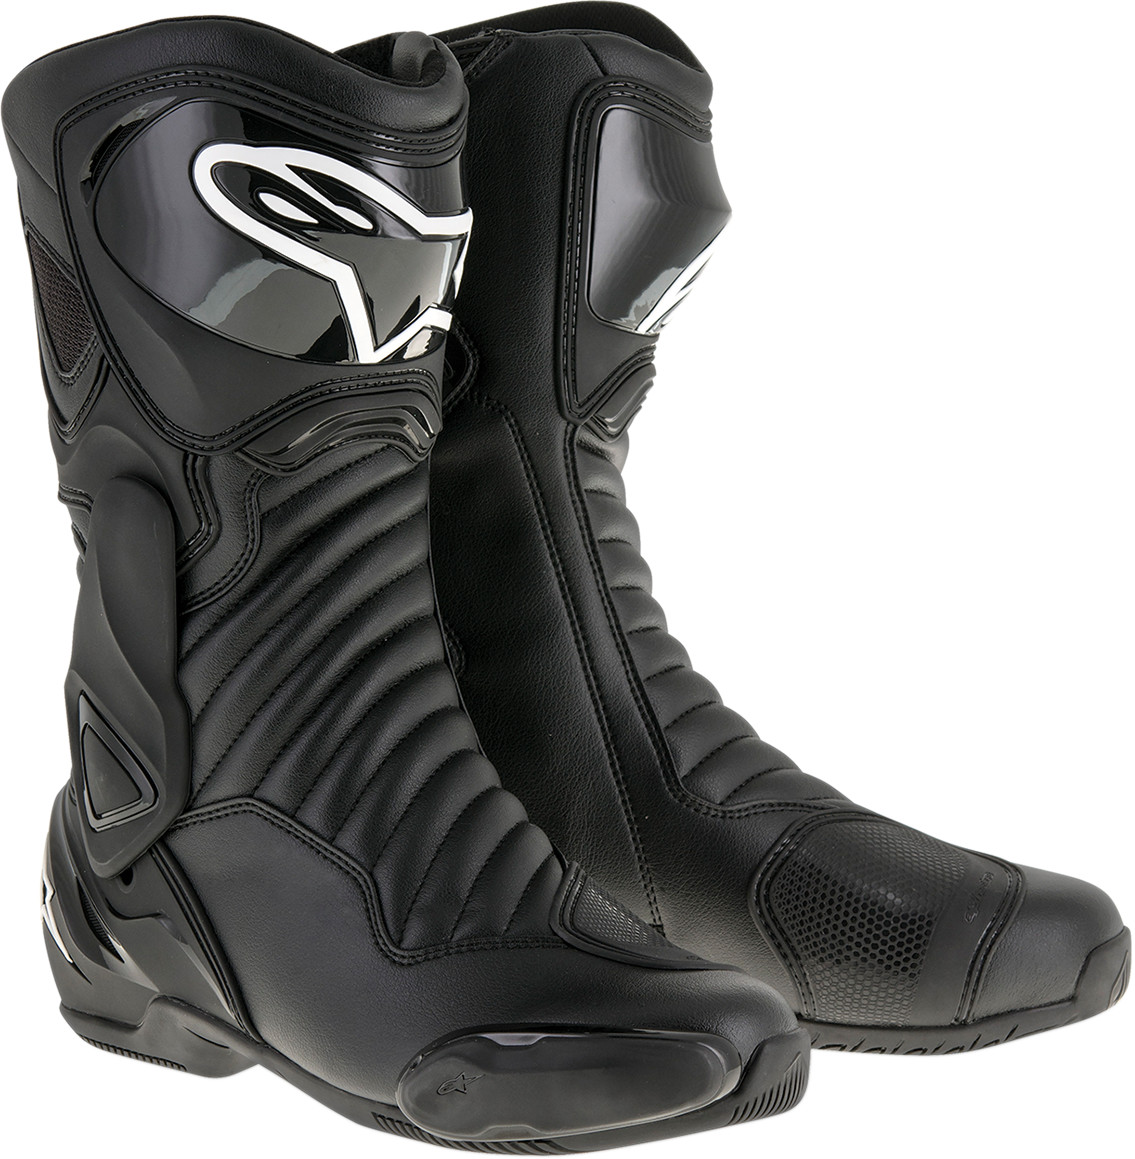 alpinestars smx 6 v2 street riding motorcycle boots all. Black Bedroom Furniture Sets. Home Design Ideas